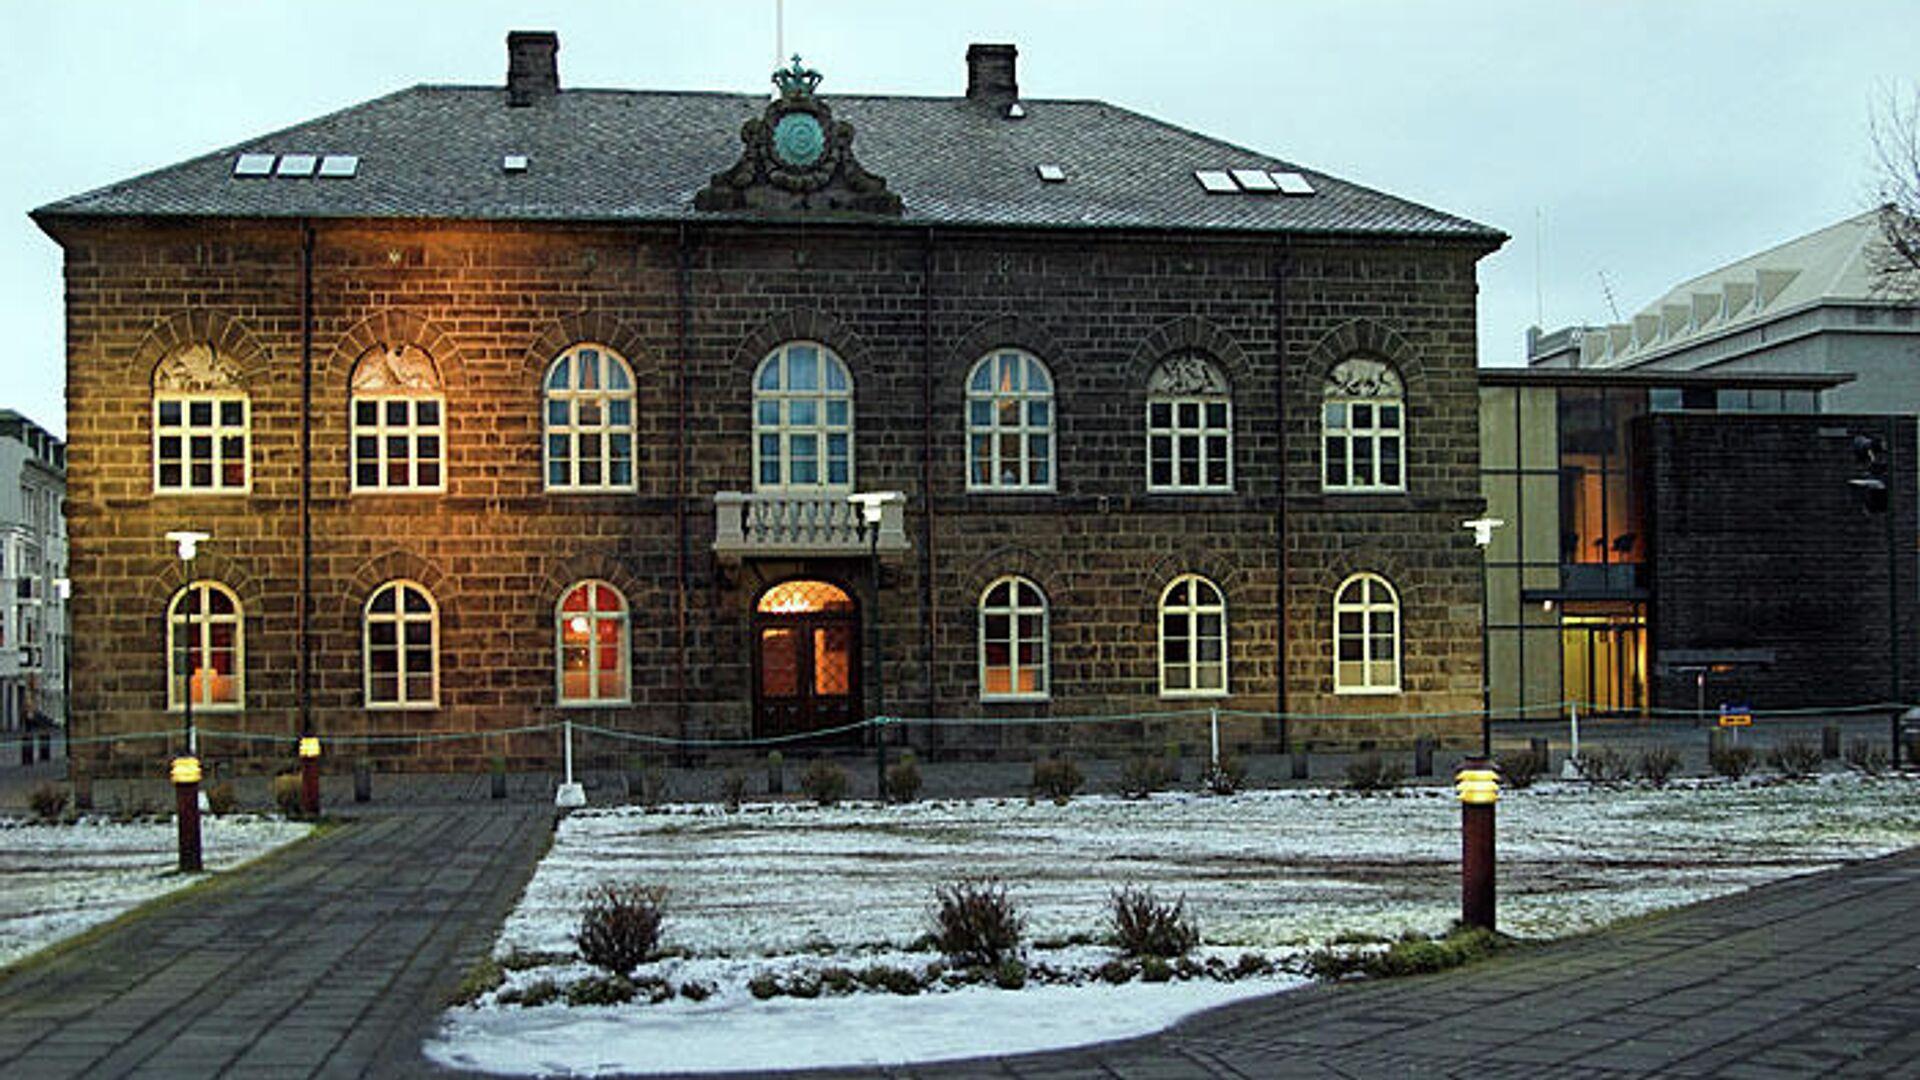 Parliament Building in Reykjavík, Iceland - Sputnik International, 1920, 28.09.2021